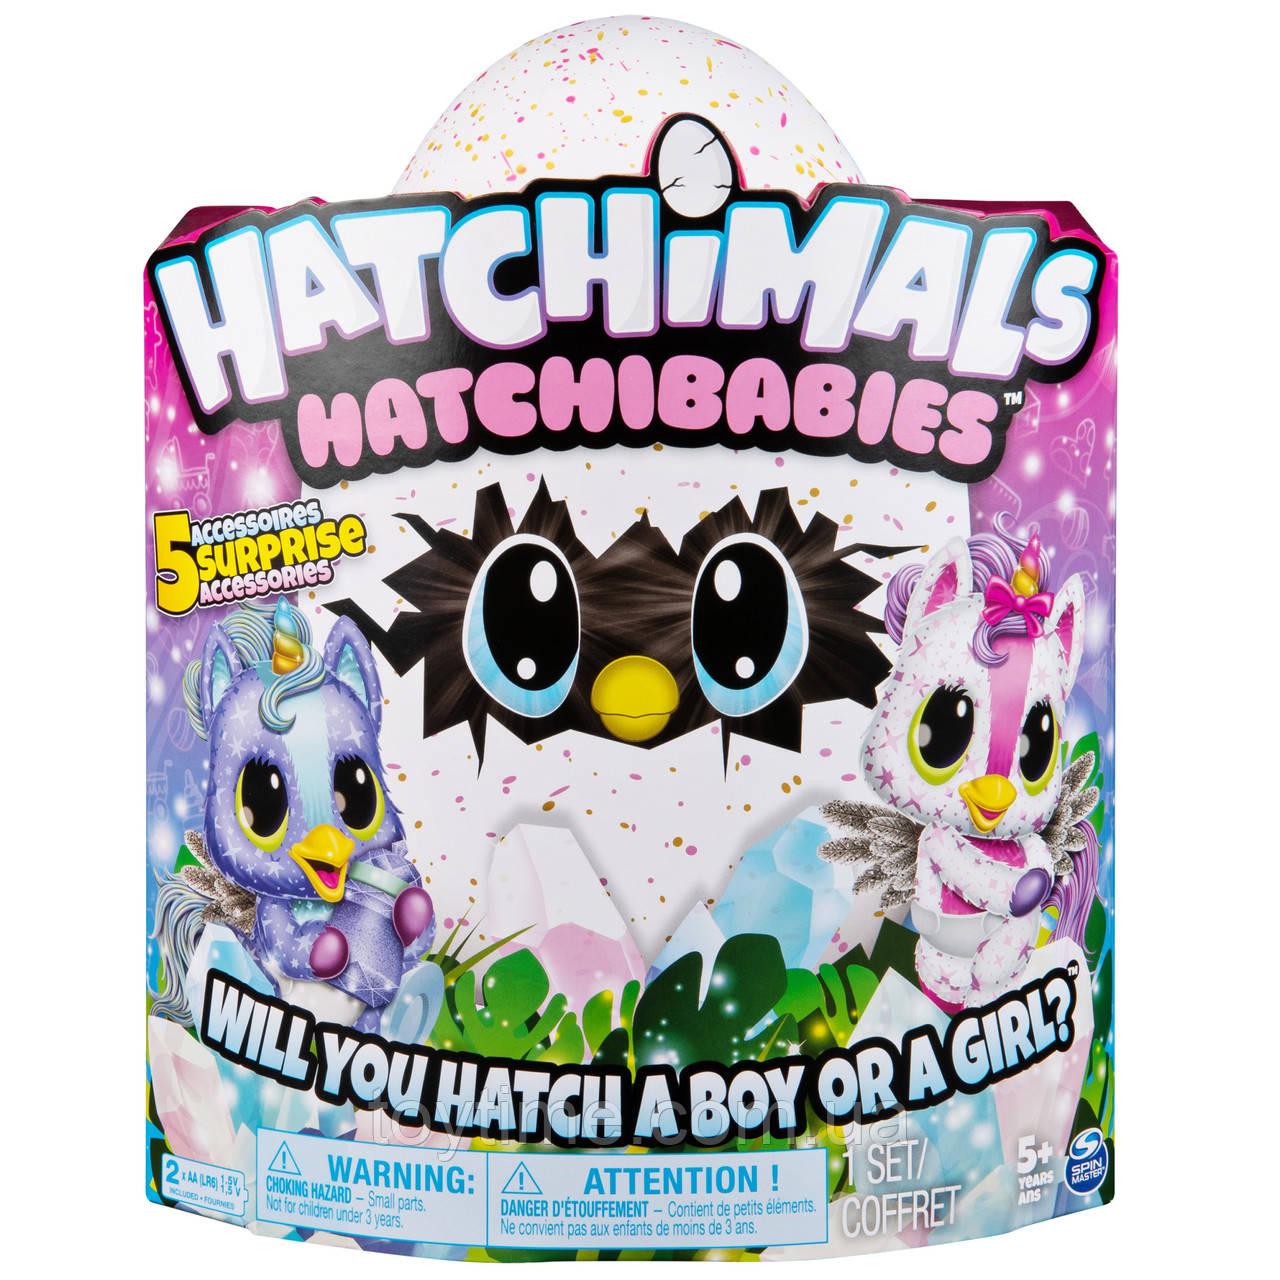 Хэтчималс Хетчибейбиз Юникет Spin Master / Hatchimals HatchiBabies Unikeets Hatching Egg